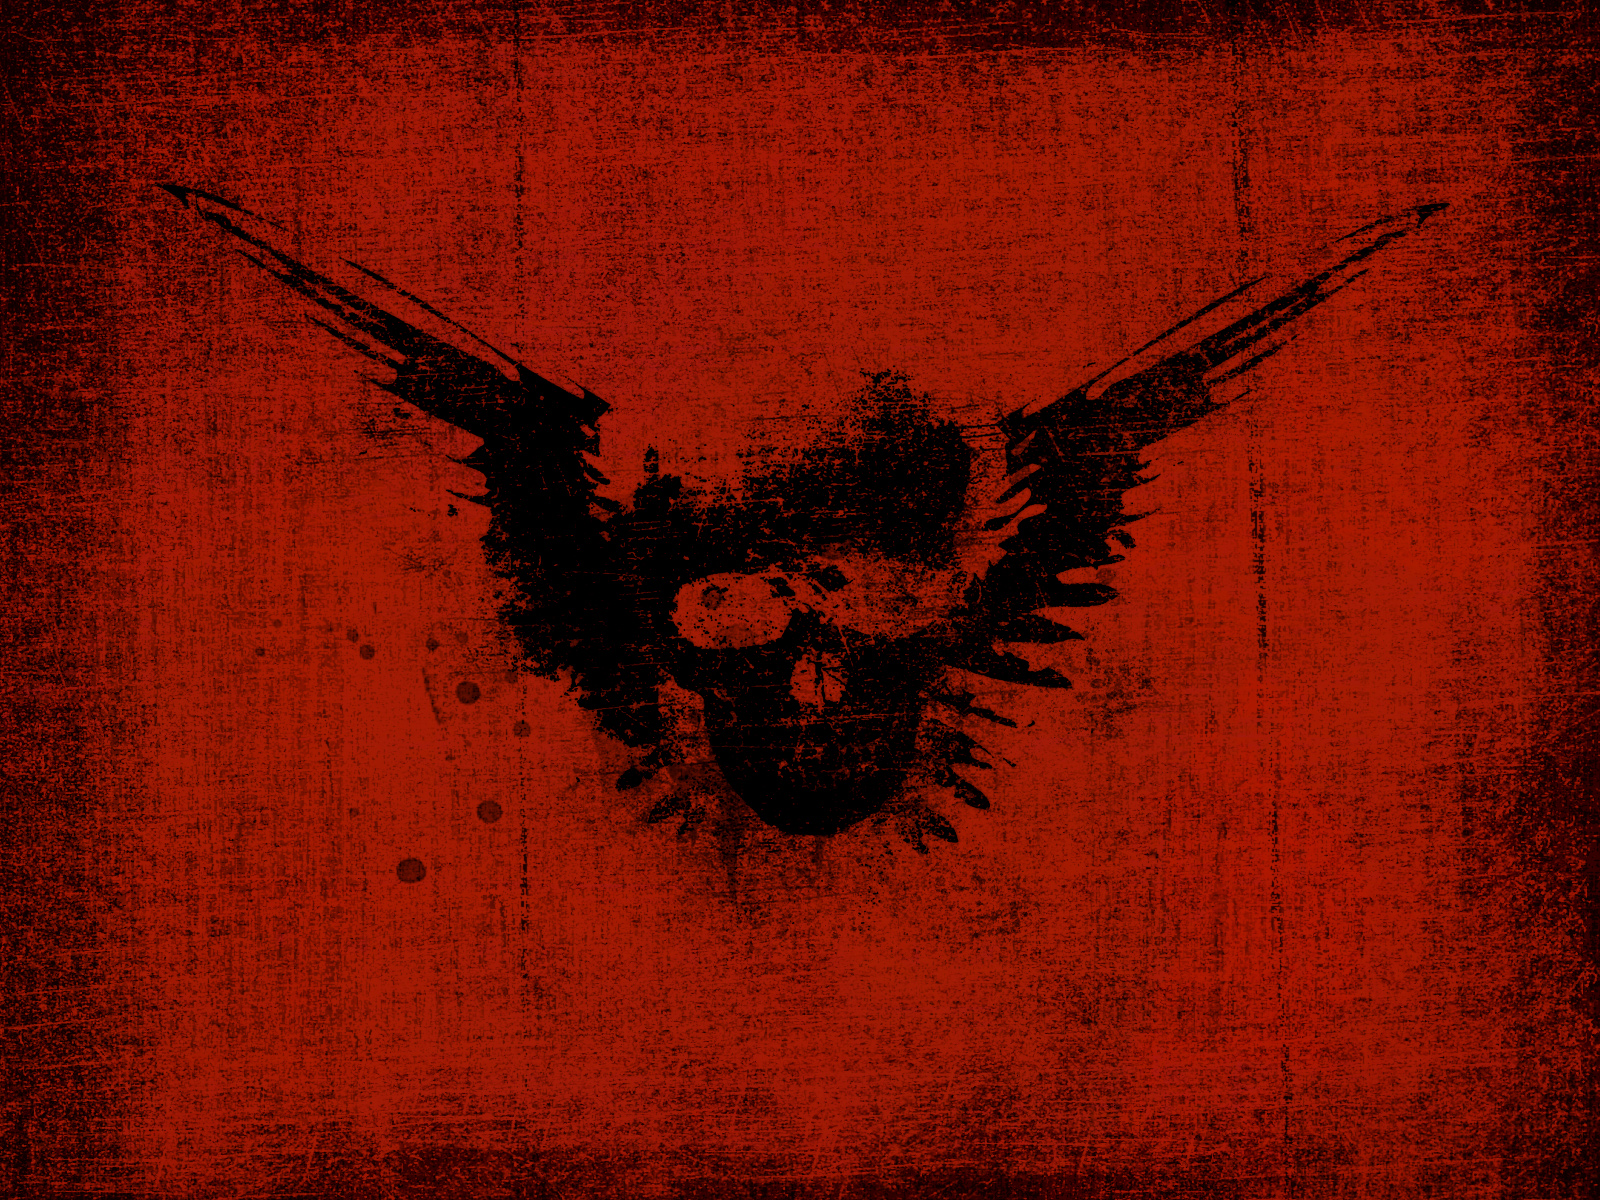 red skull wallpaper by muskawo on